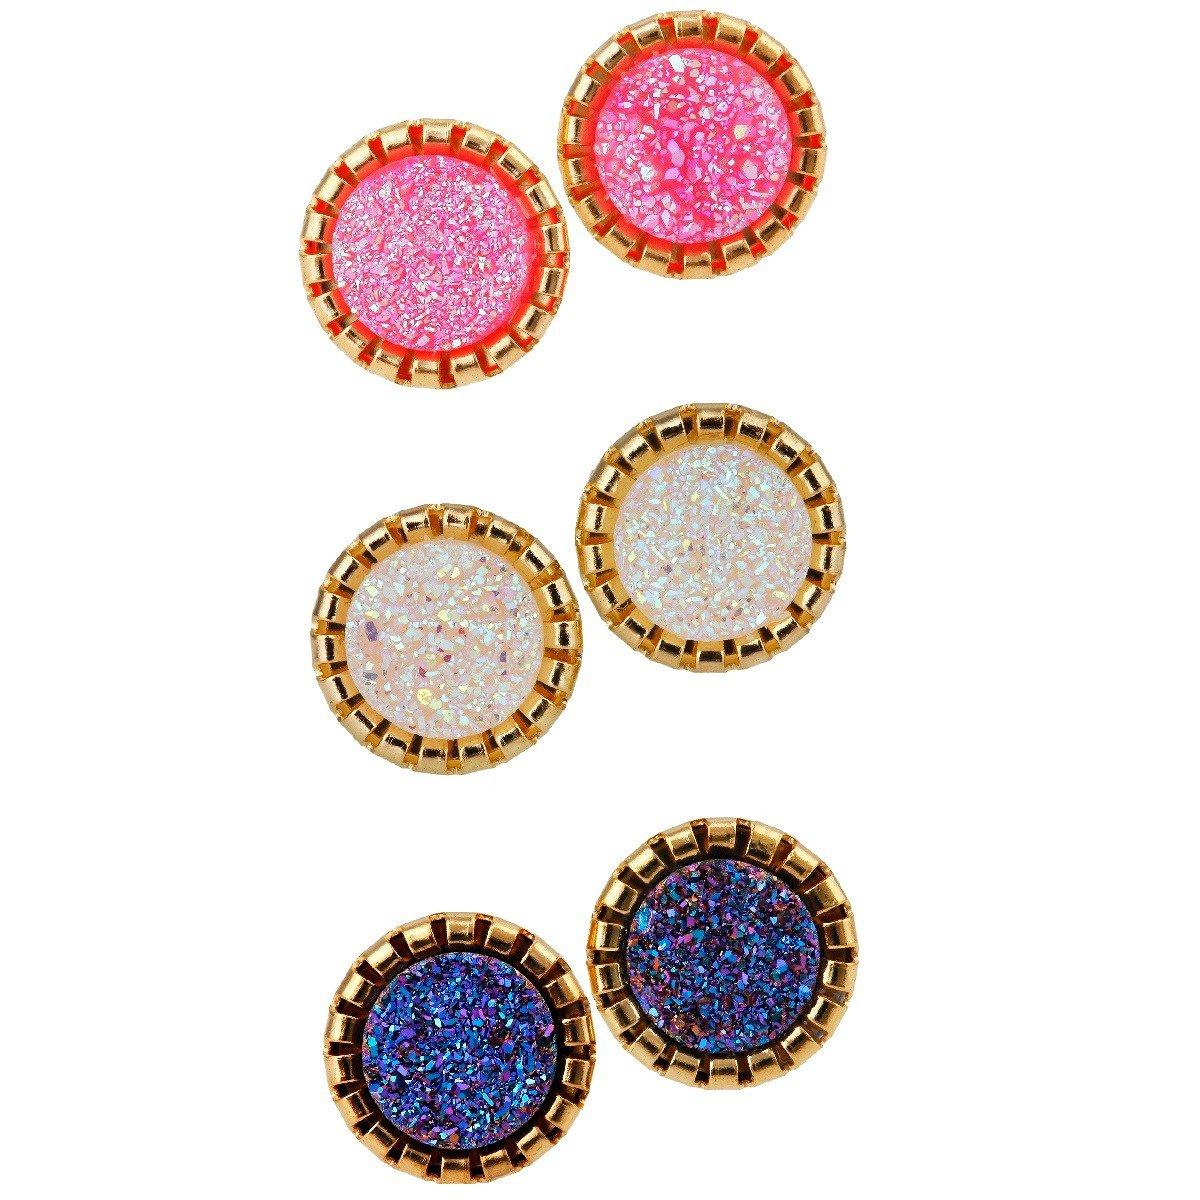 SUNYIK Pink/White/Blue Purple AB Aura Titanium Coated Geode Druzy Stud Earrings,Pack of 3